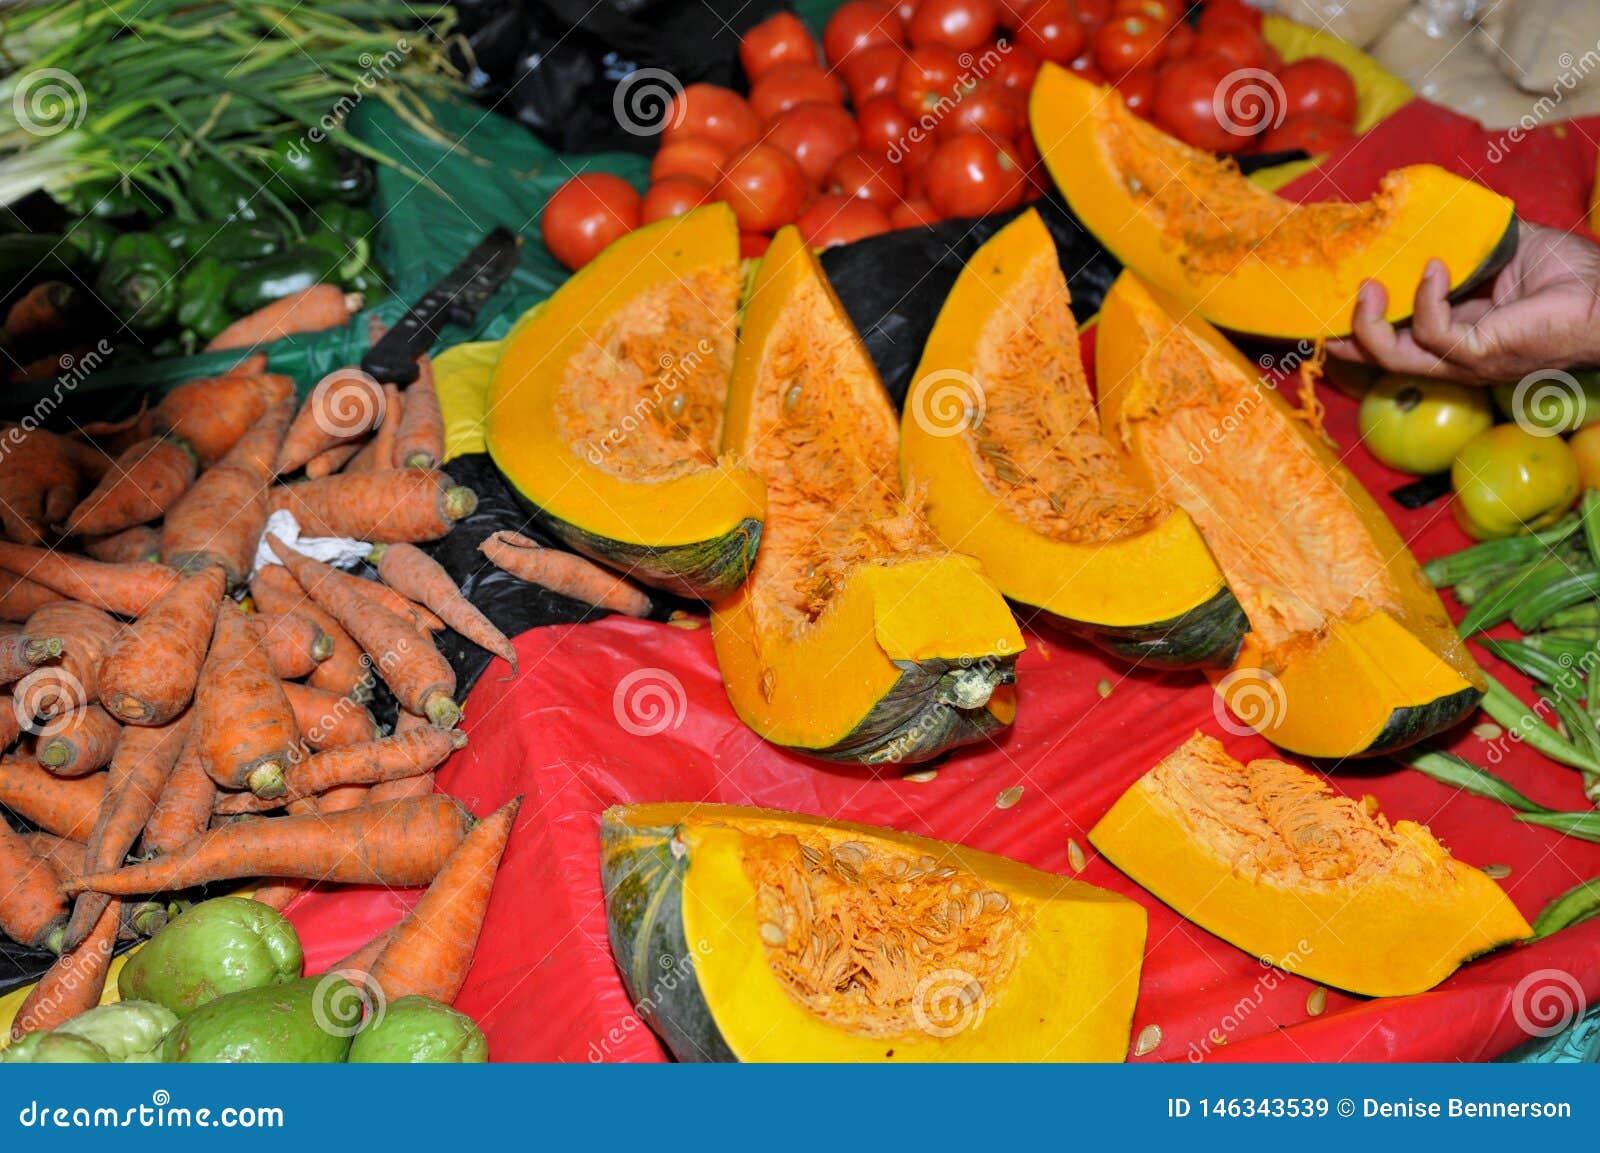 Shopping at Farmers Market Pumpkin, tomatoes, carrots and Okra